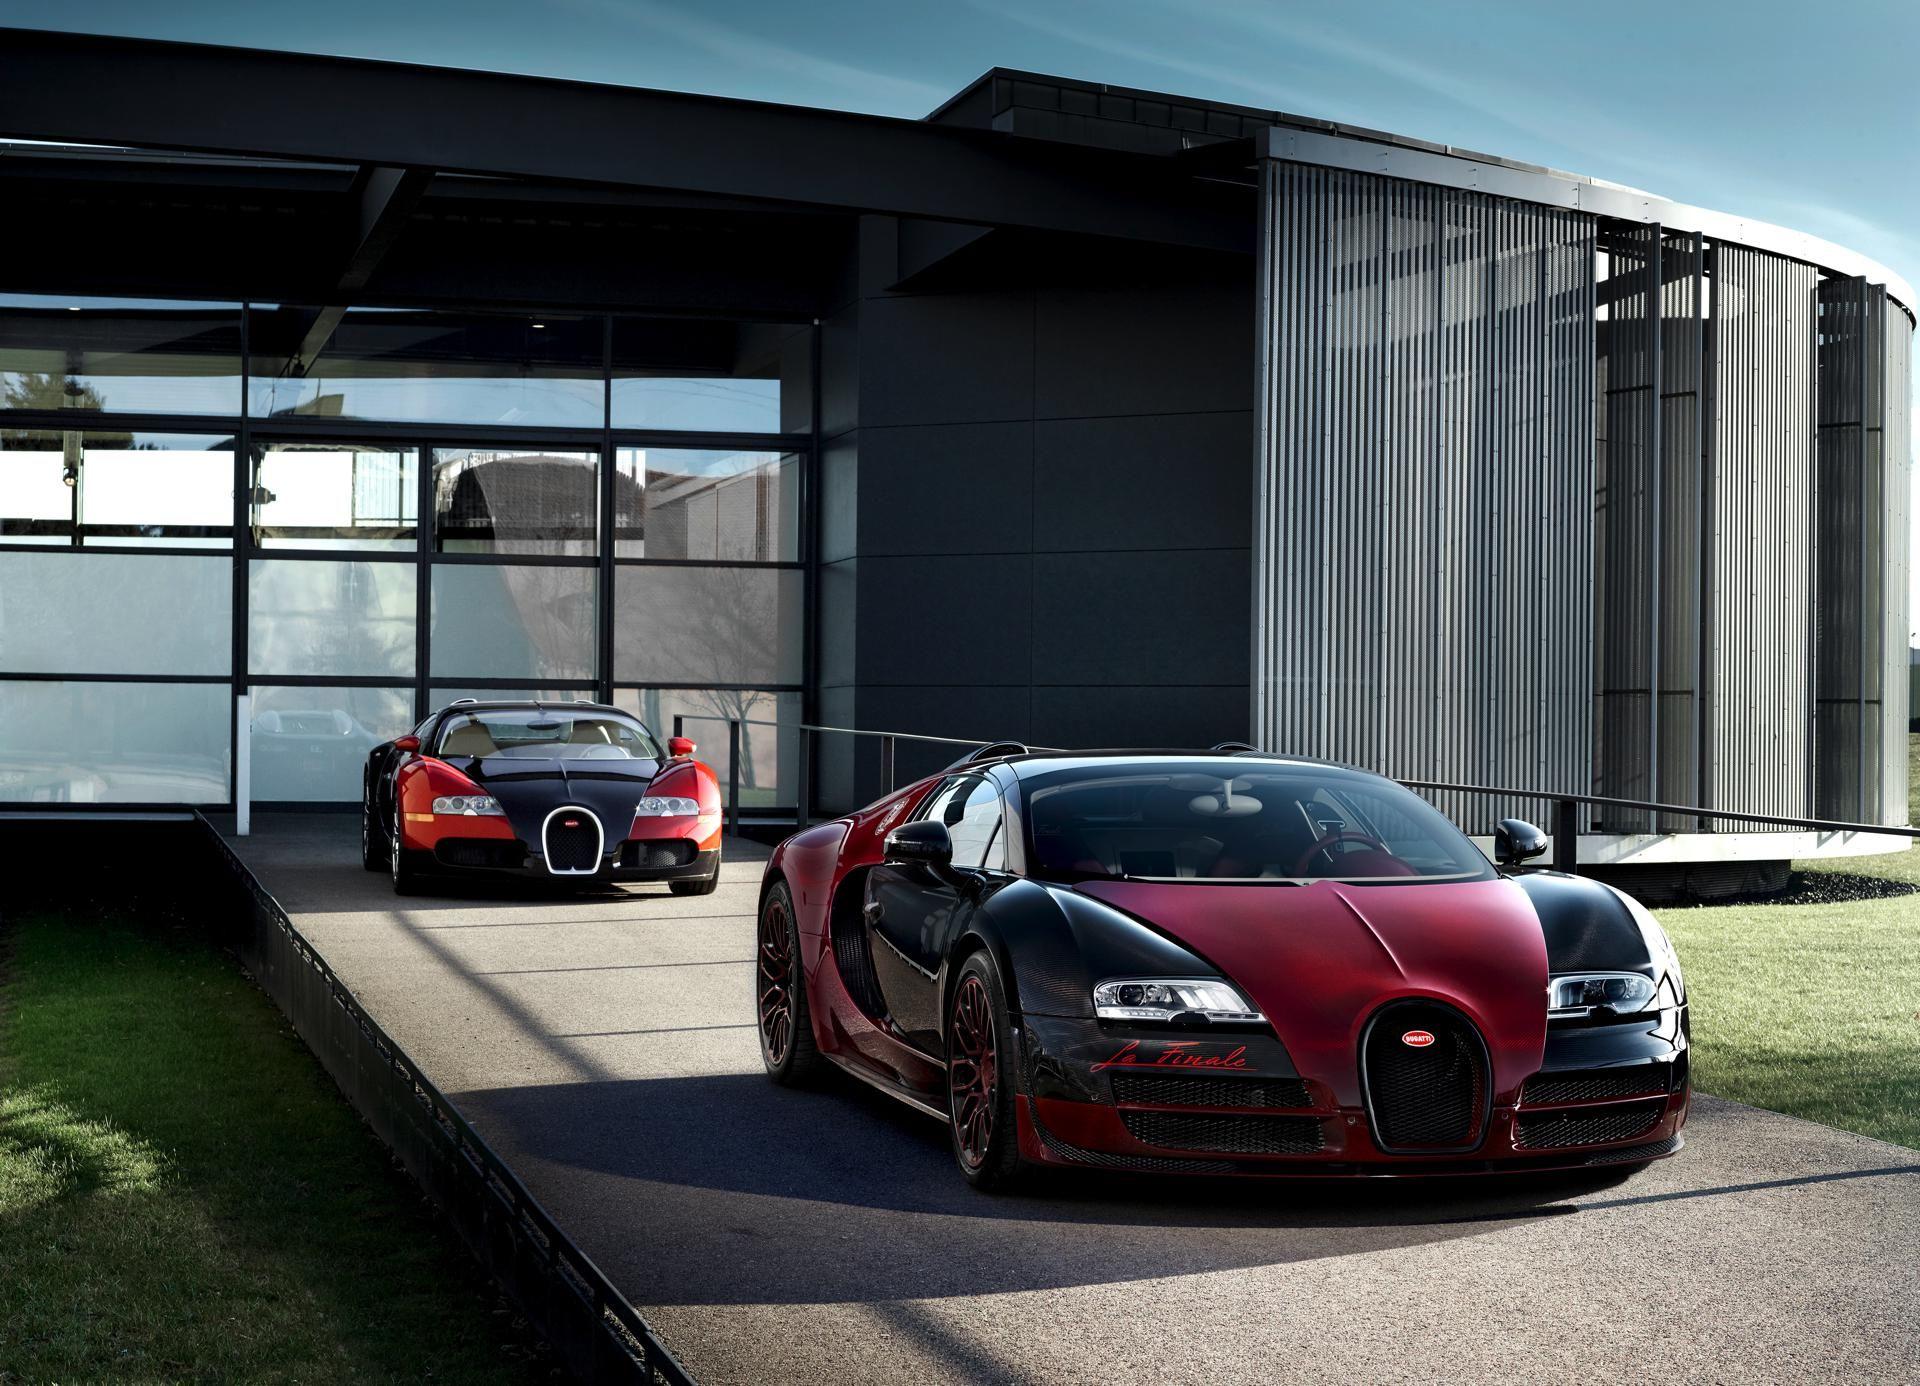 67f6d3285c1da04822cac6726bcff64c Interesting Bugatti Veyron Grand Sport Vitesse Vs Pagani Huayra Cars Trend